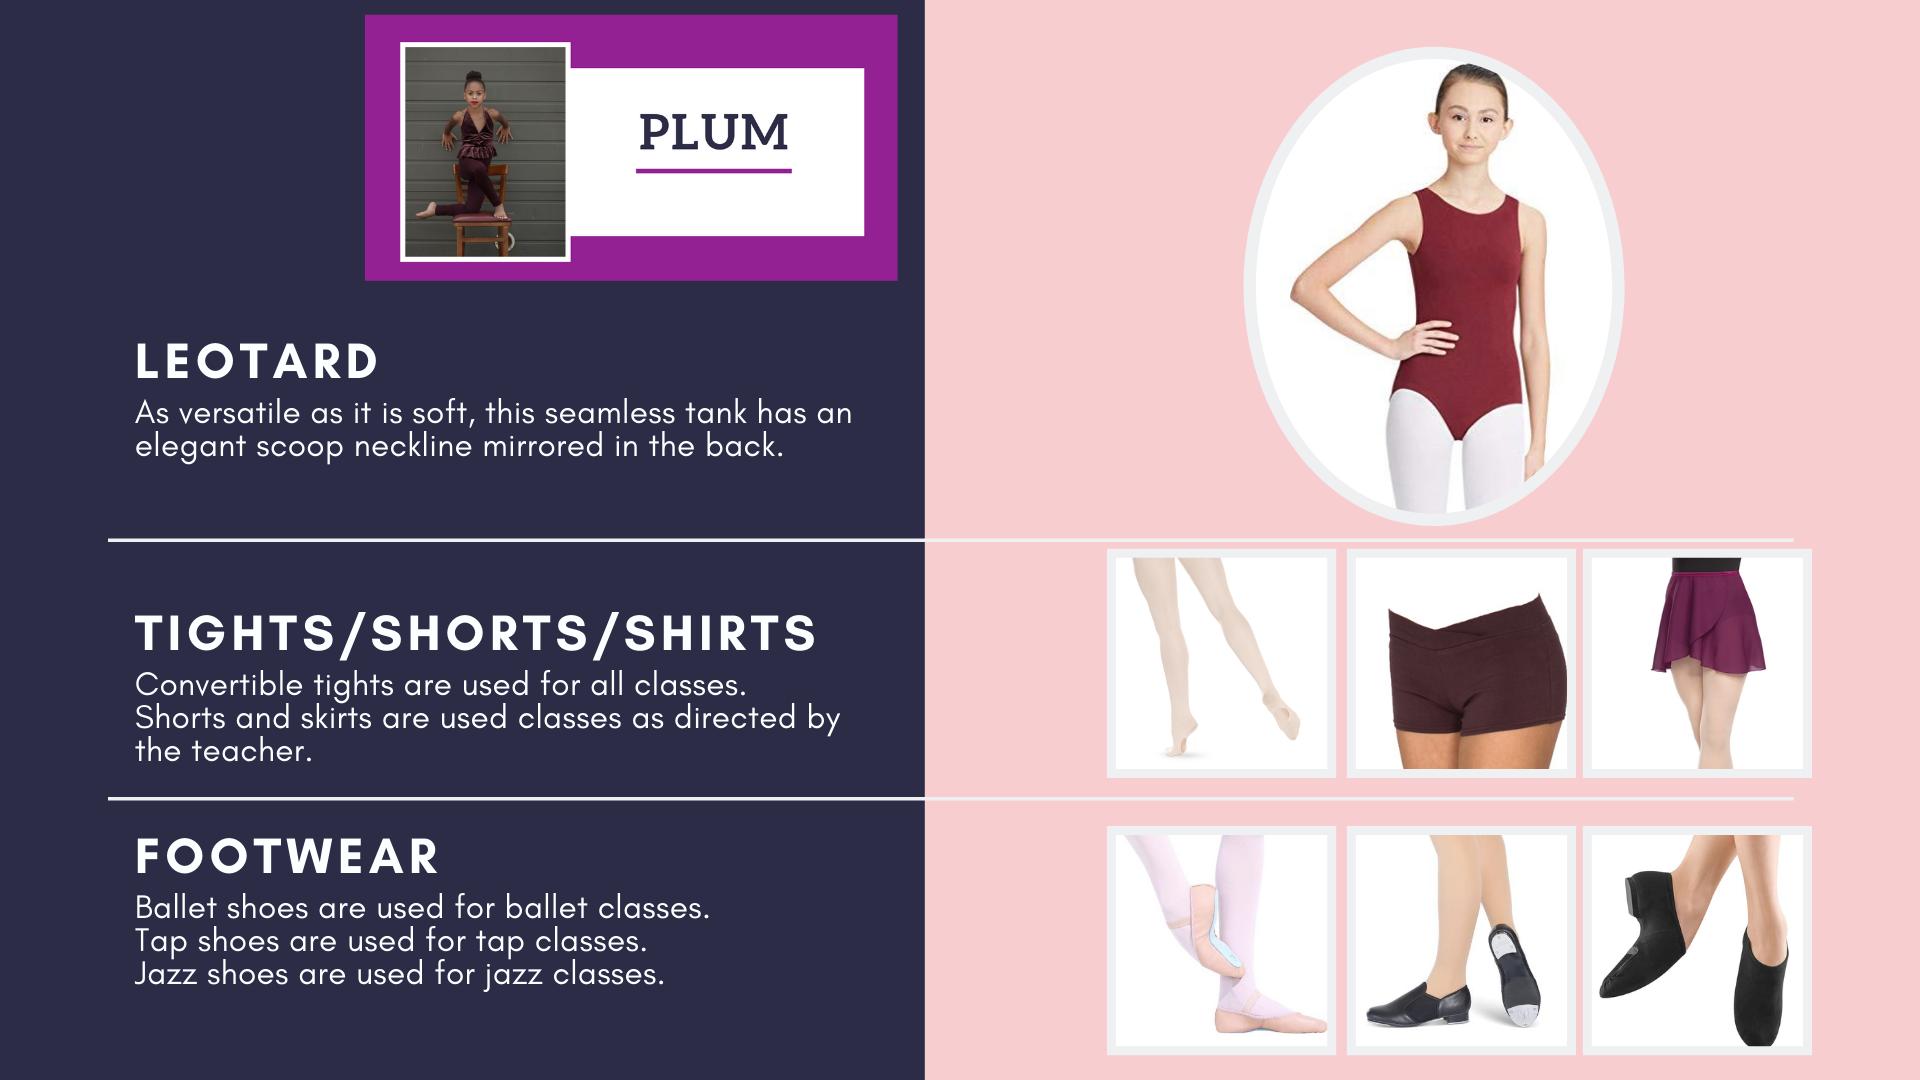 Plum Uniform